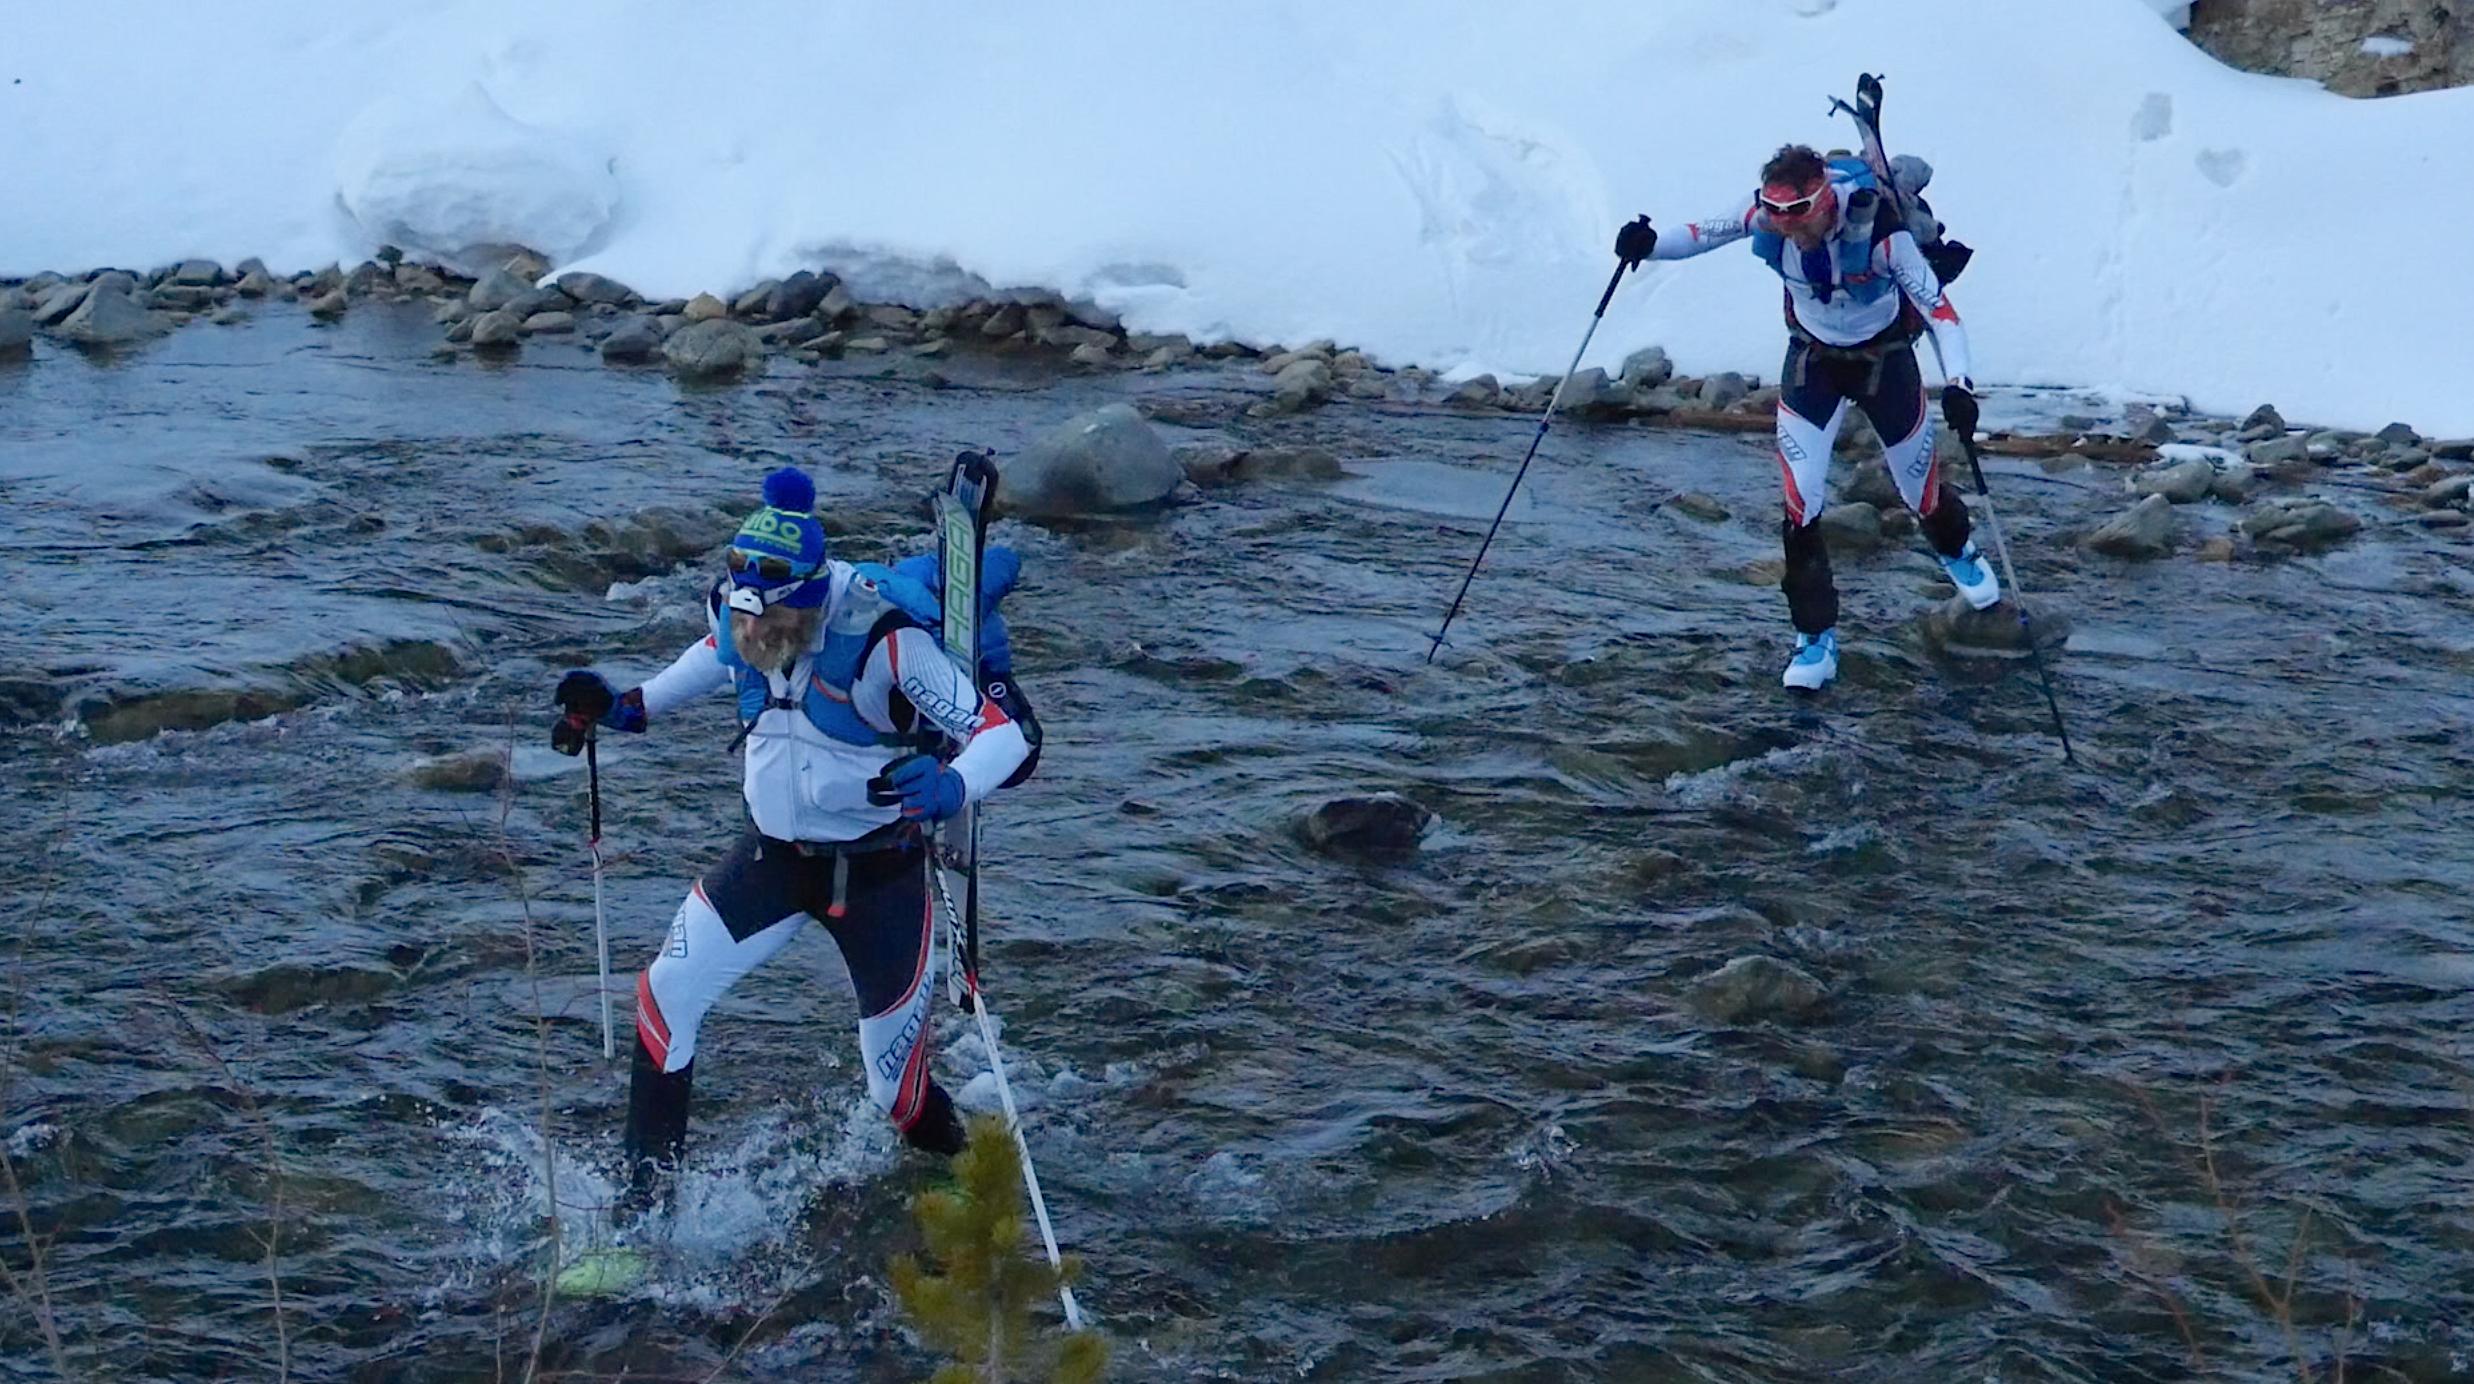 skiing the hardrock 100 – day 1